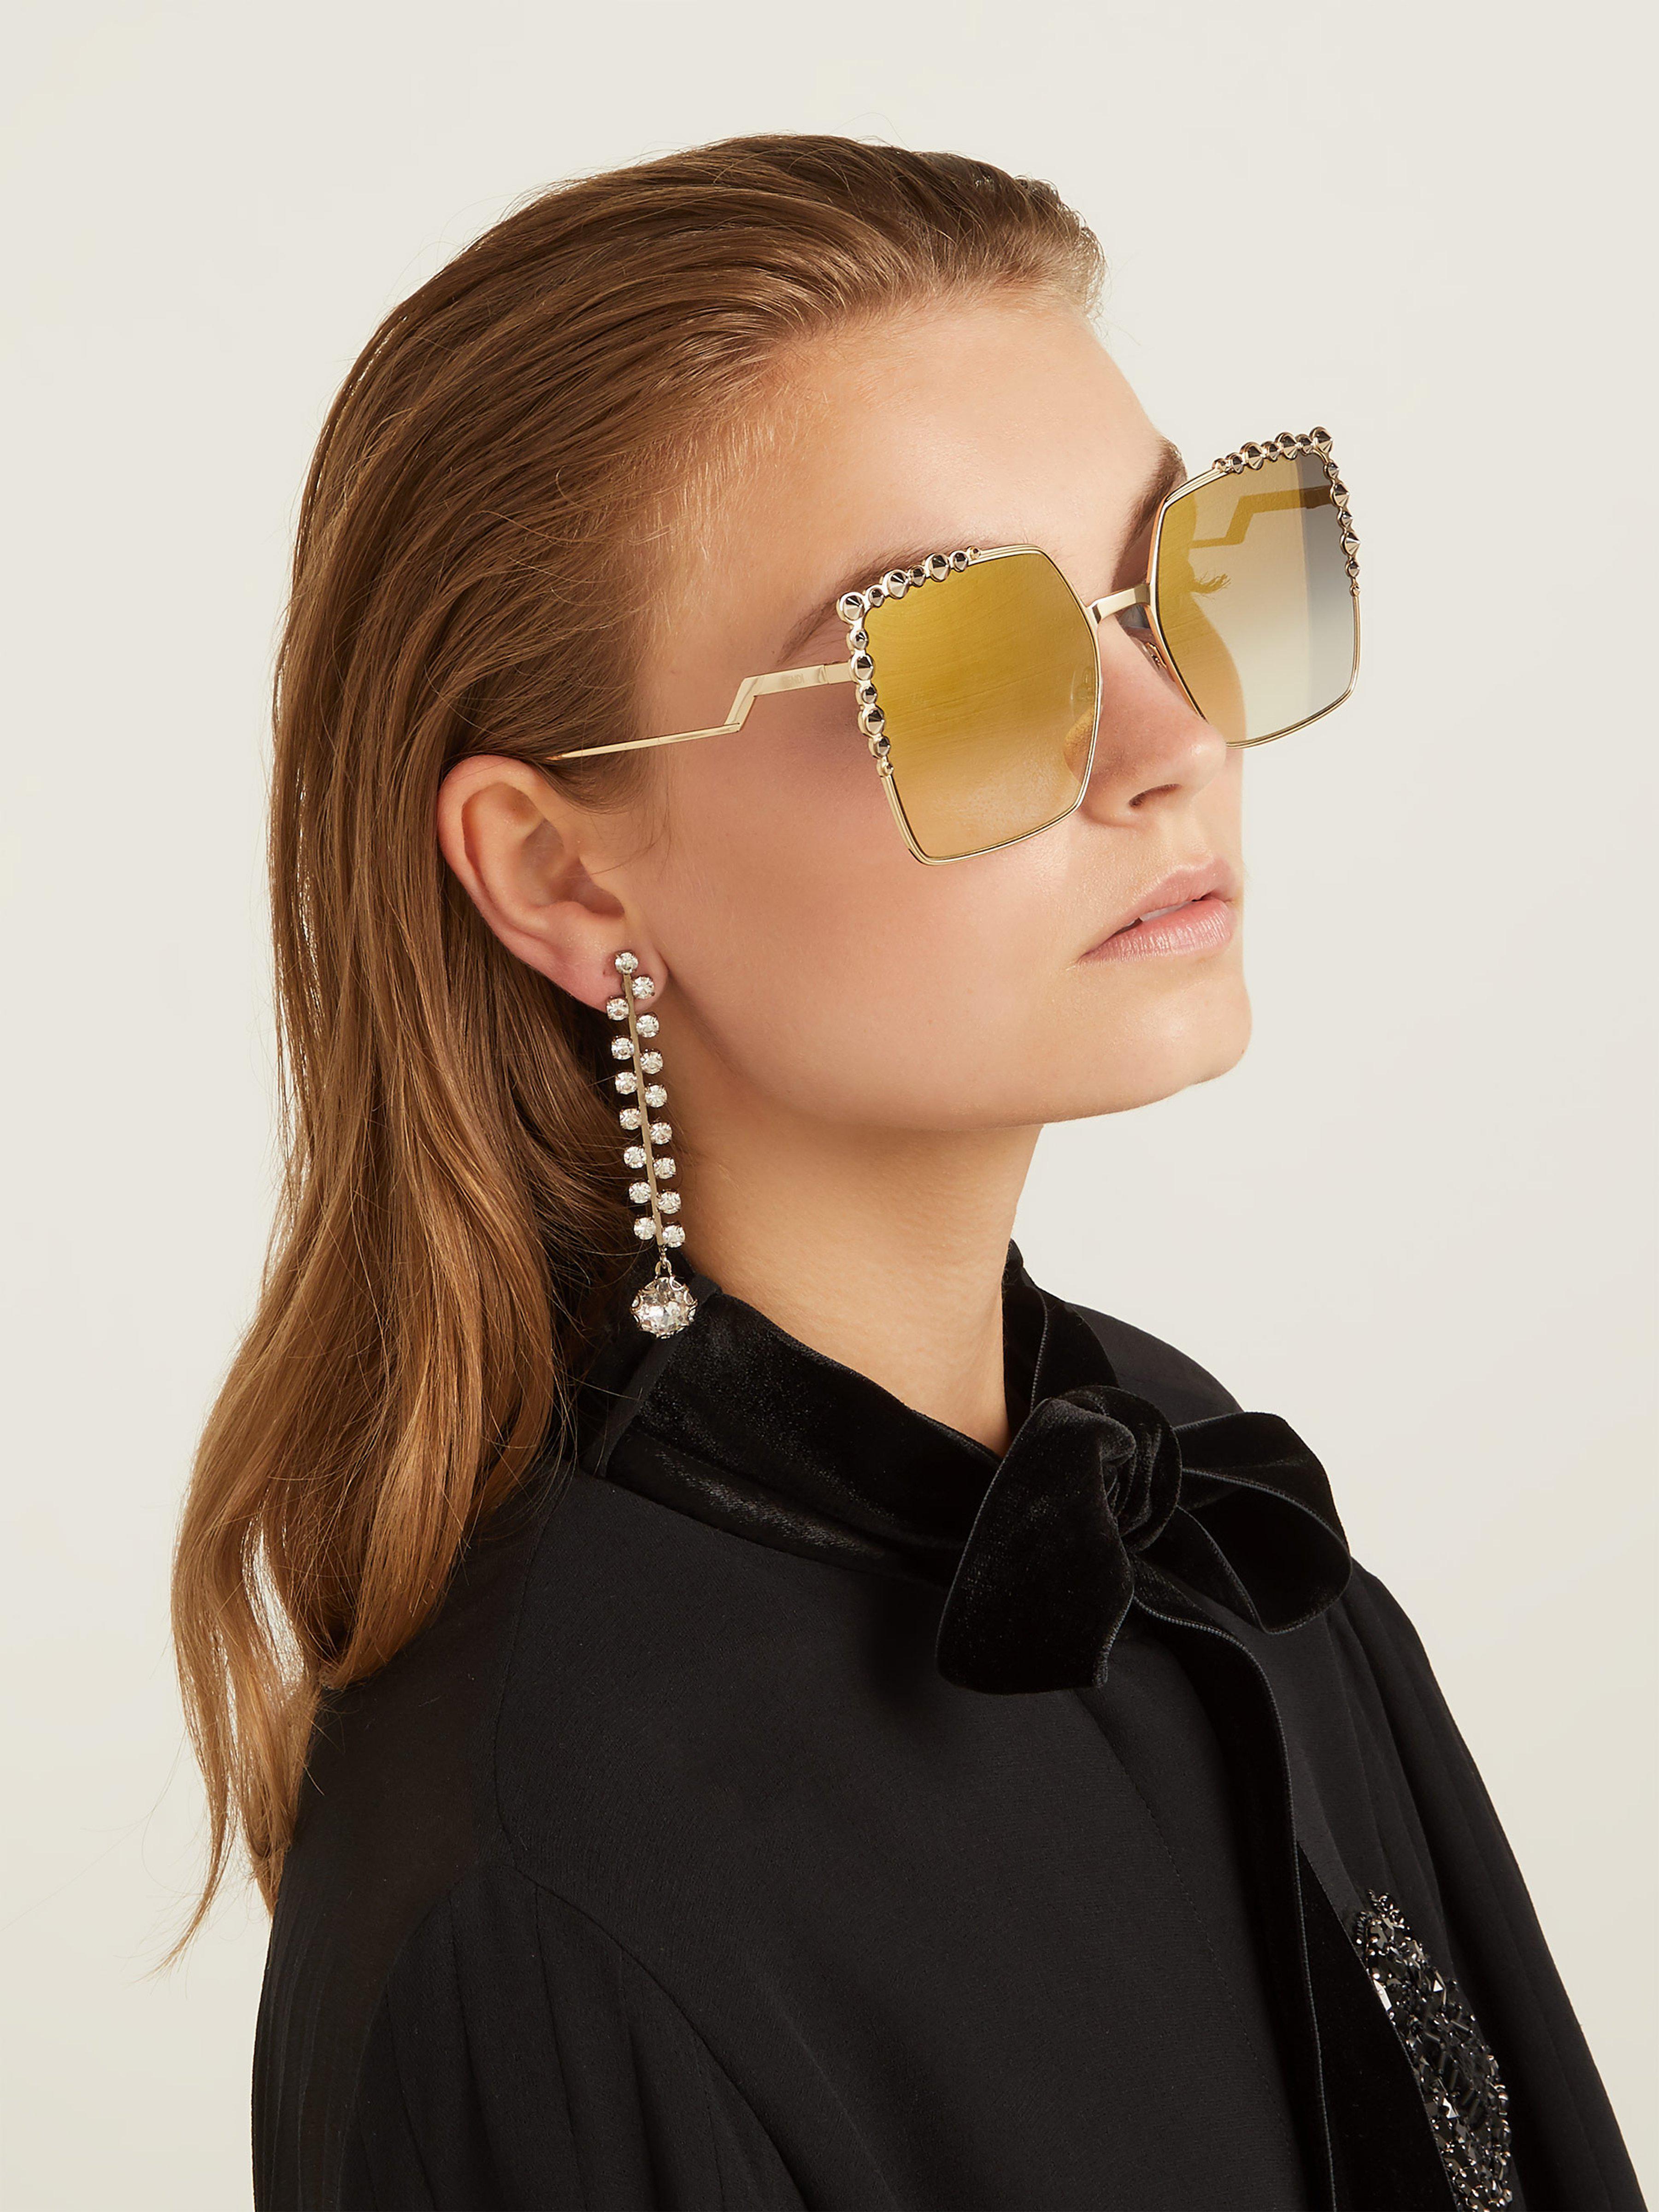 e294687541a75 Fendi Square-frame Embellished Sunglasses - Lyst